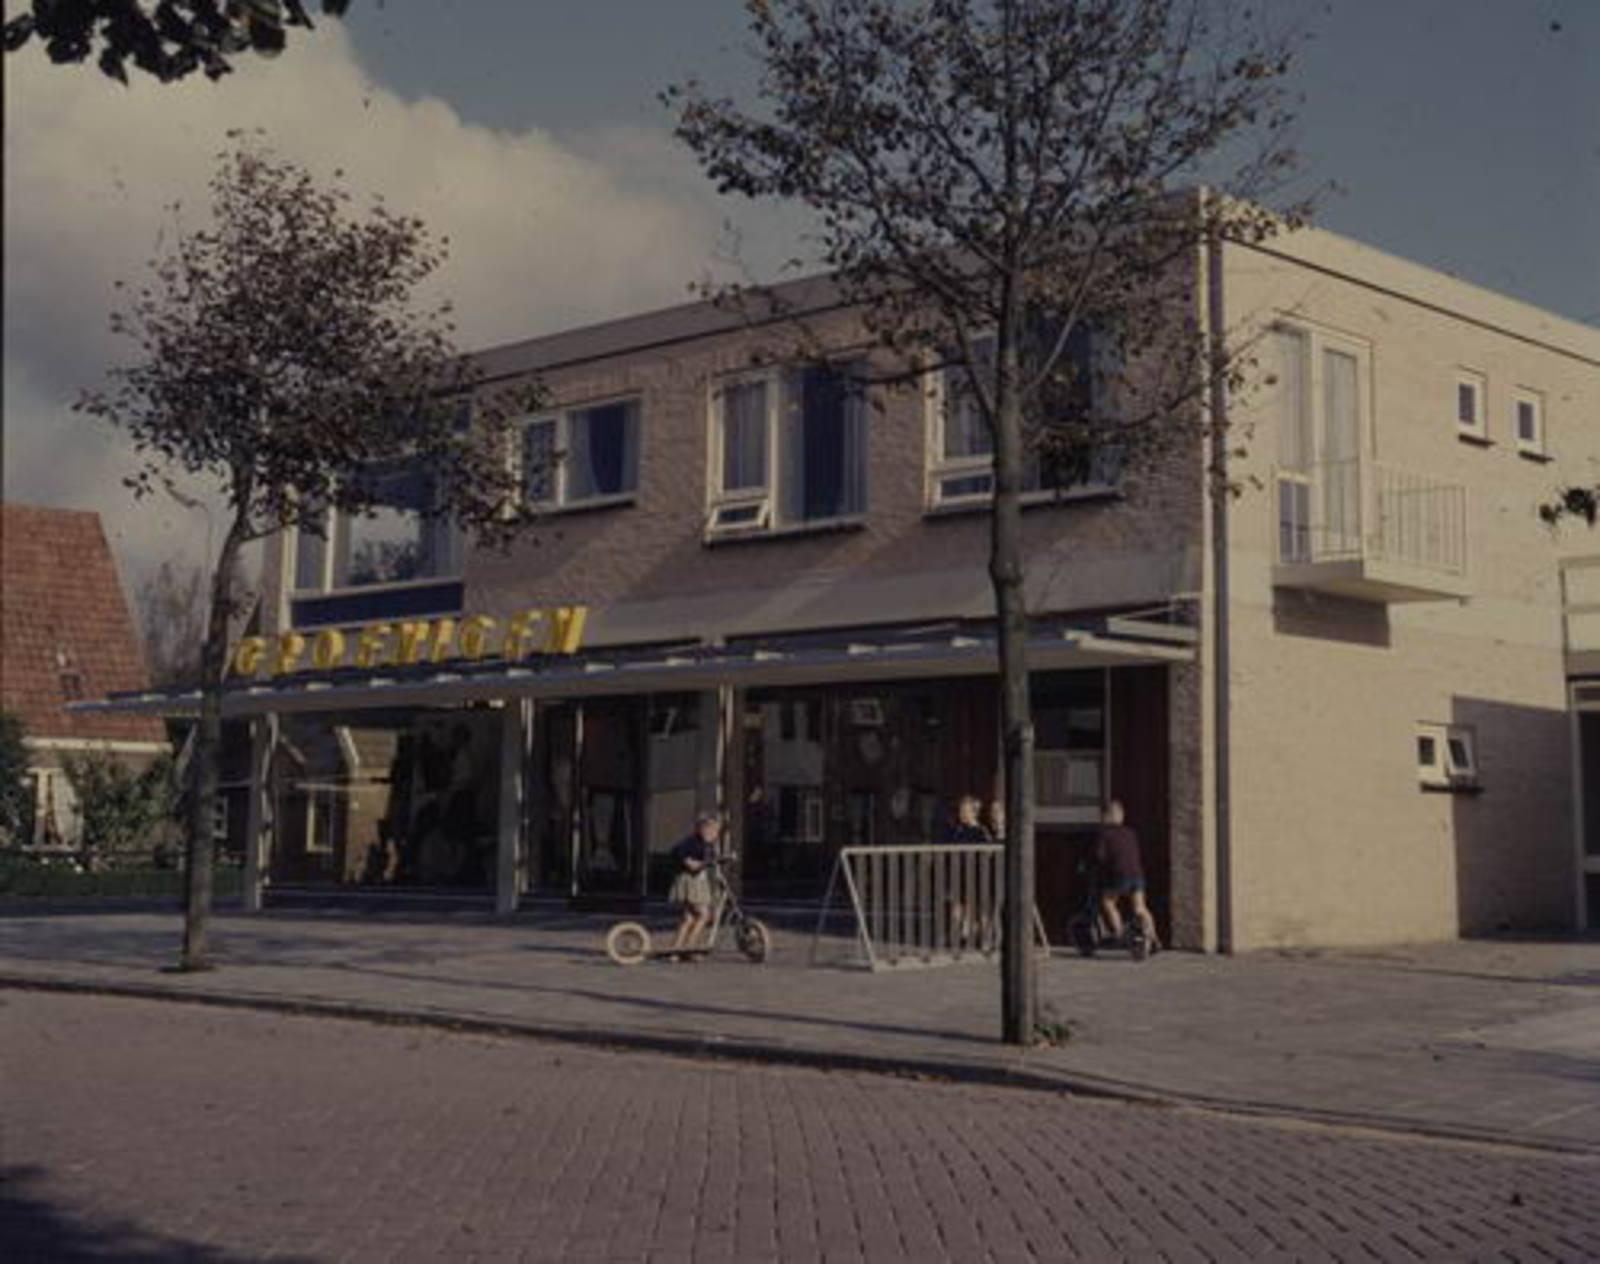 Venneperstraat O 0020 19__ Winkels v Groenigen 01